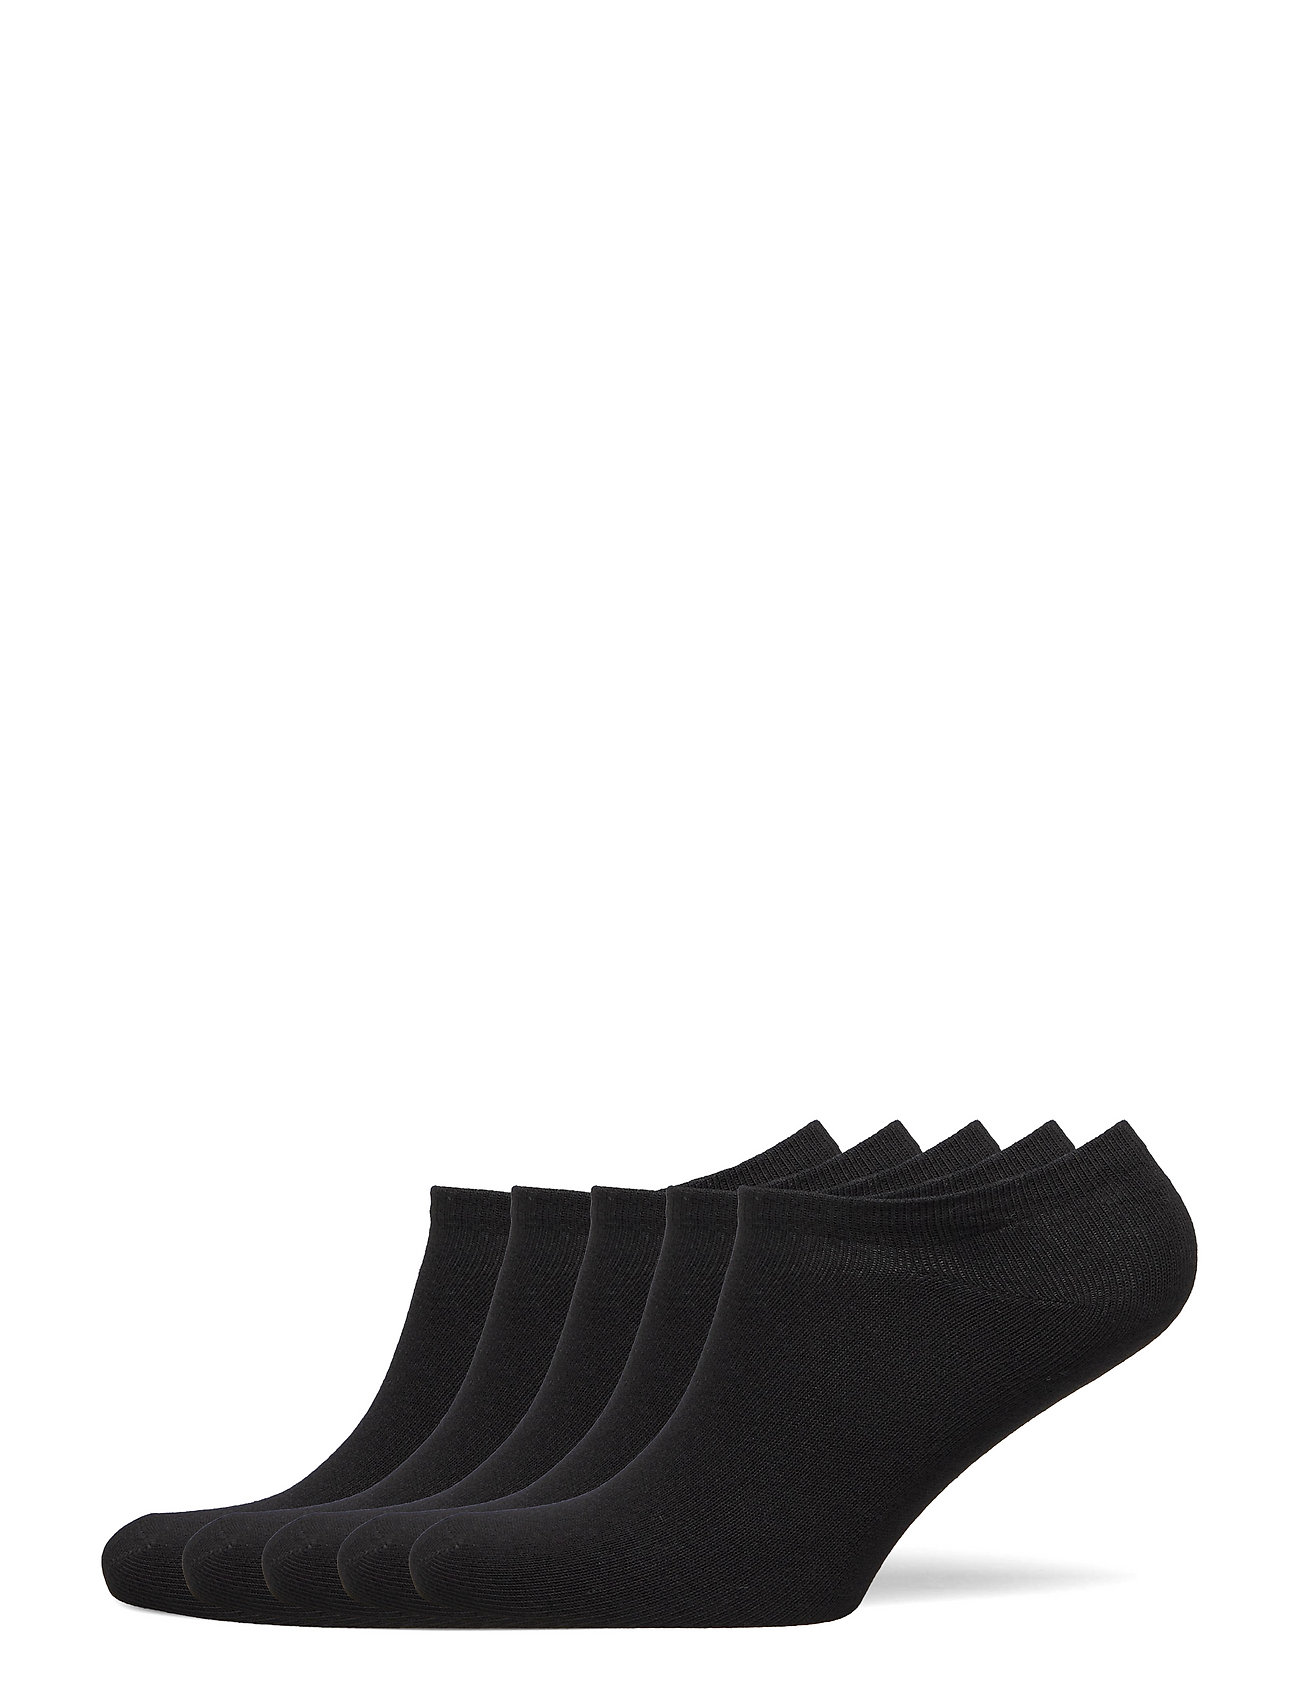 Boozt Merchandise Odense 5-pack sock - BLACK